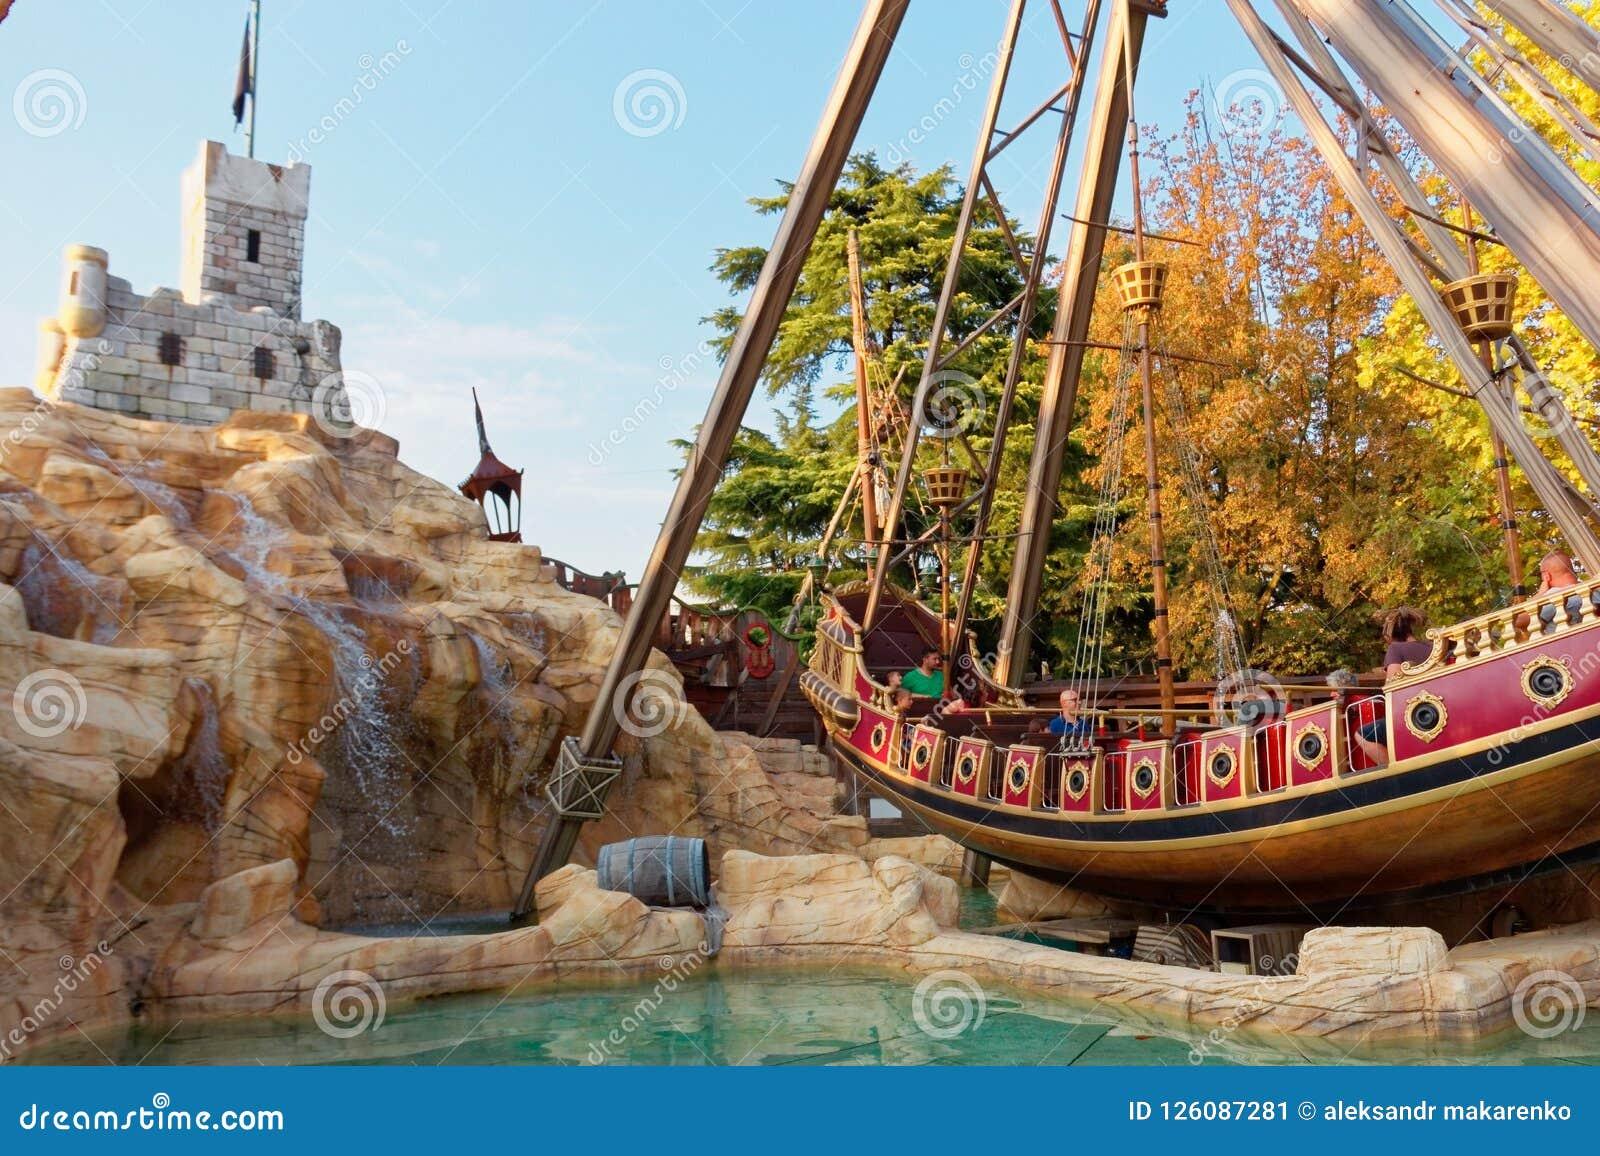 Verona, Italy August 18, 2018: Leoland Amusement Park  Pirate